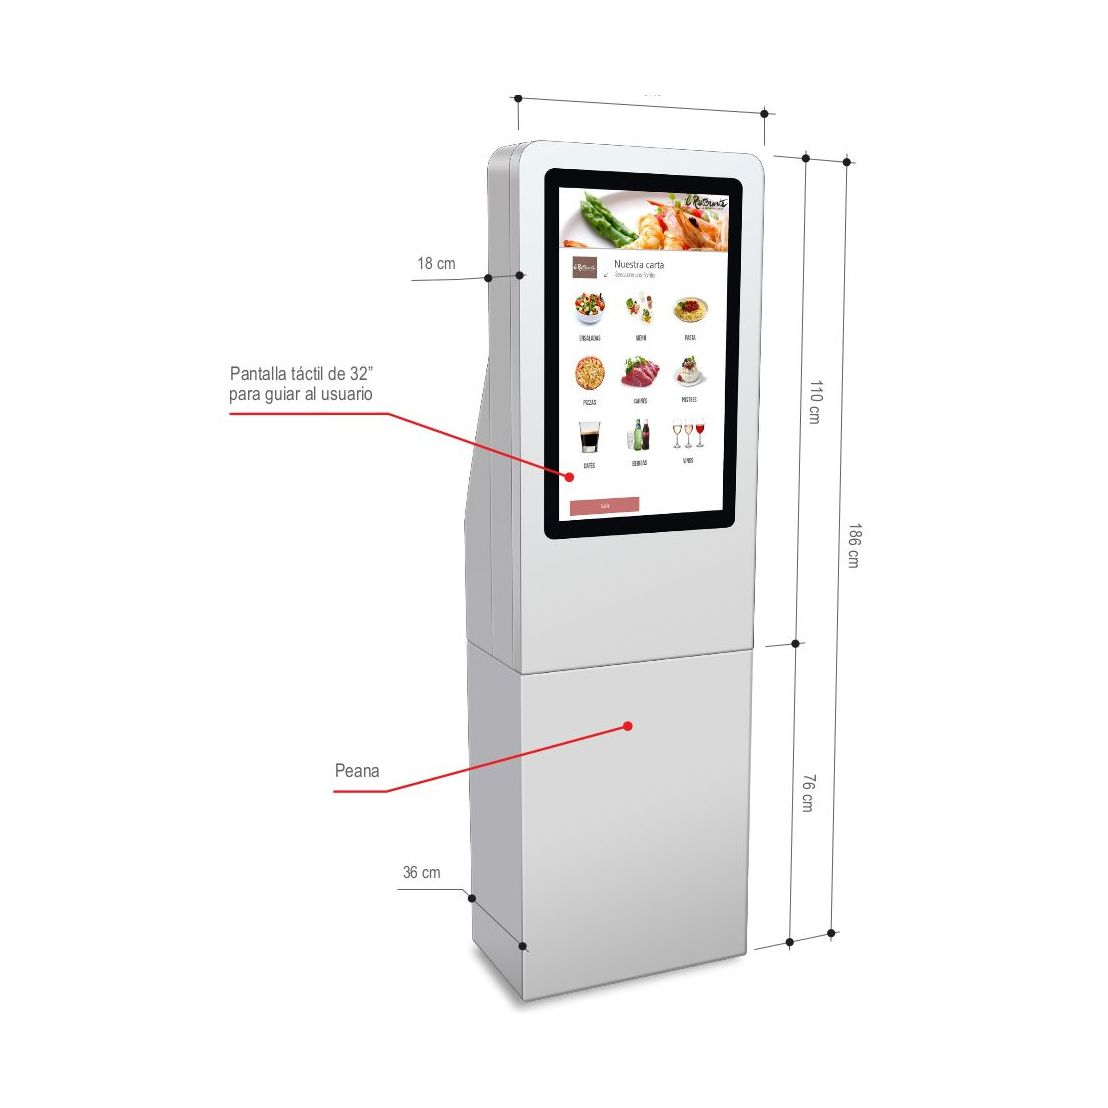 T-Quiosk modelo 100: Productos de Discove